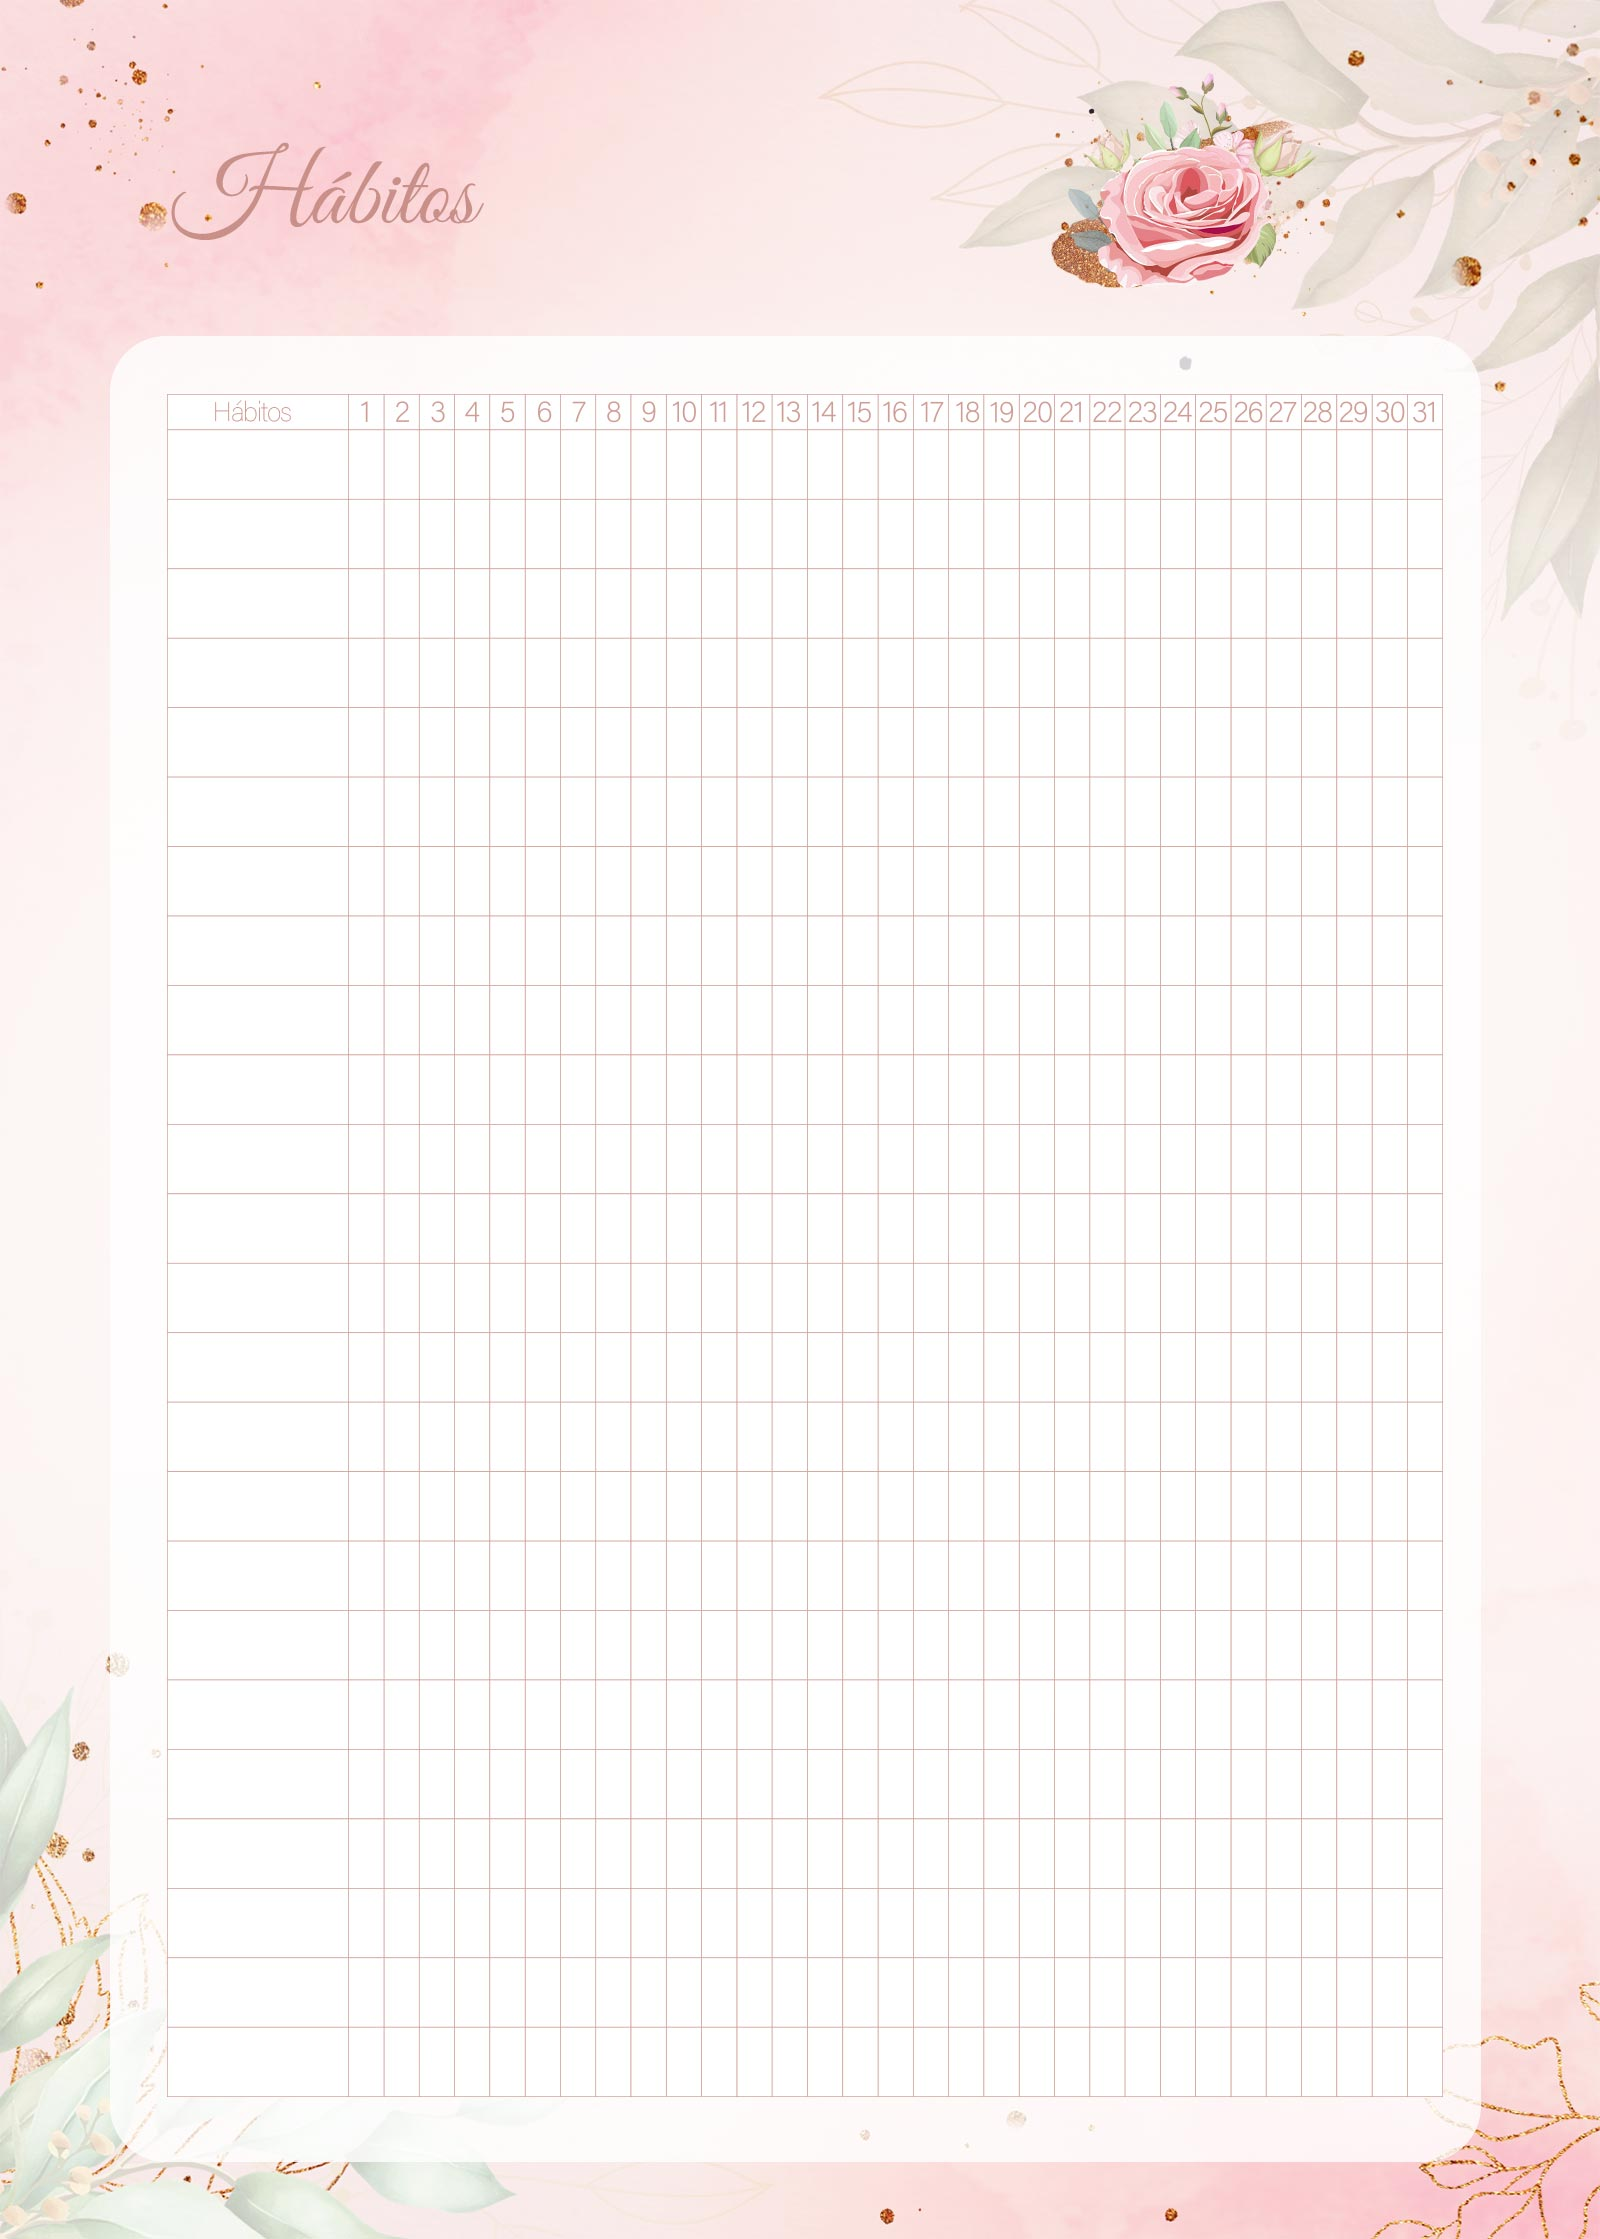 Planner 2021 Floral com Inicial Habitos